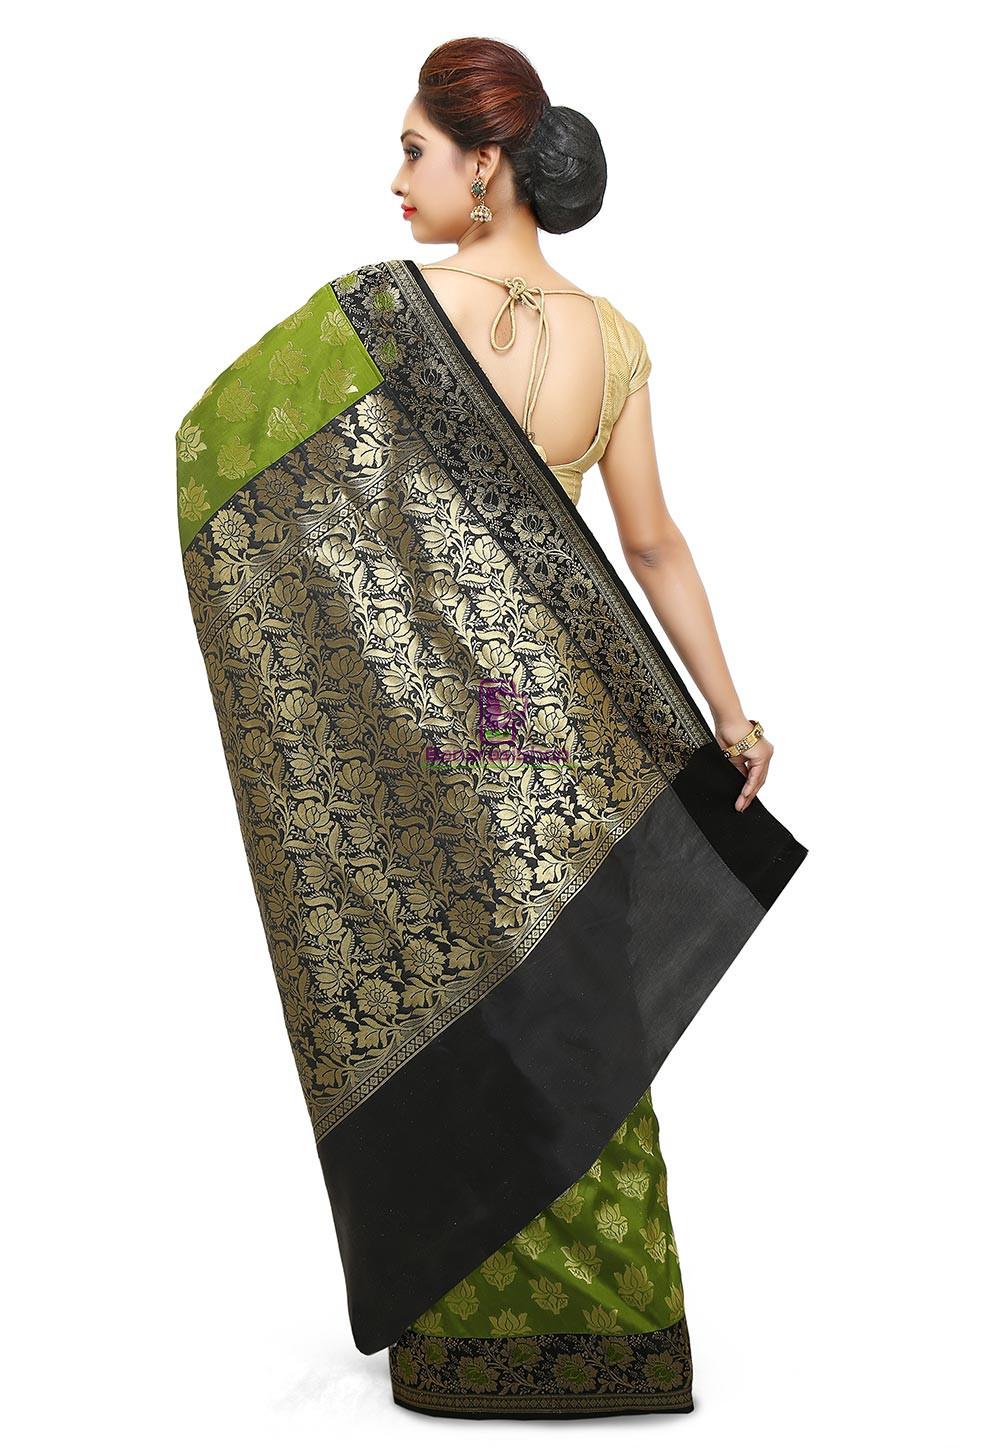 Banarasi Saree in Olive Green 5